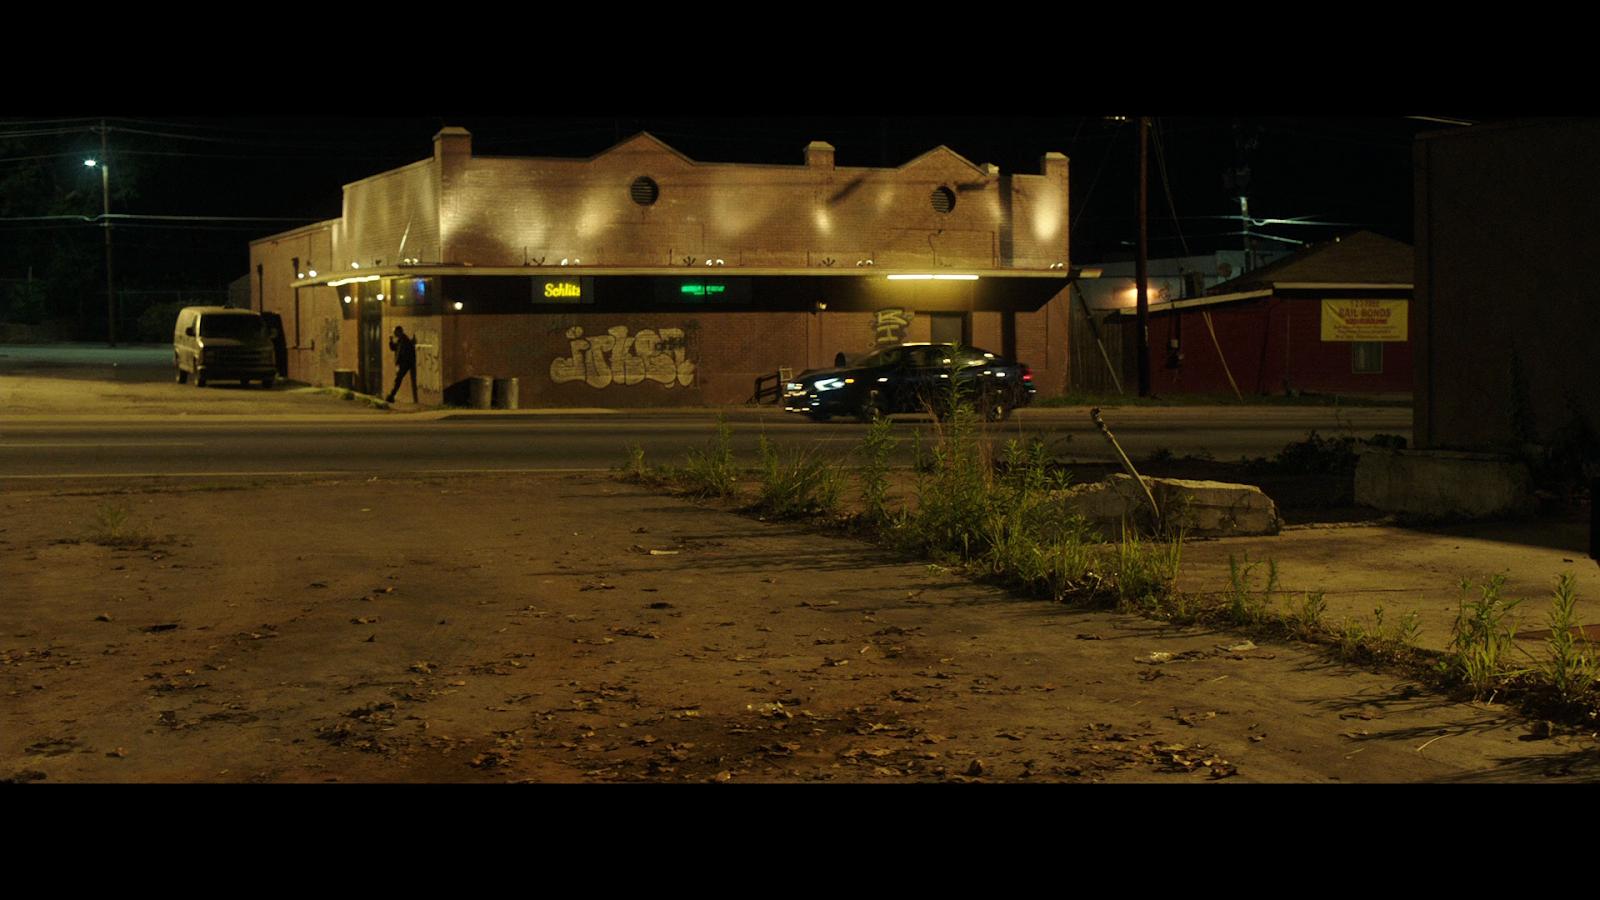 Noche De Juegos (2018) BRRip Full 1080p Latino-Ingles captura 2